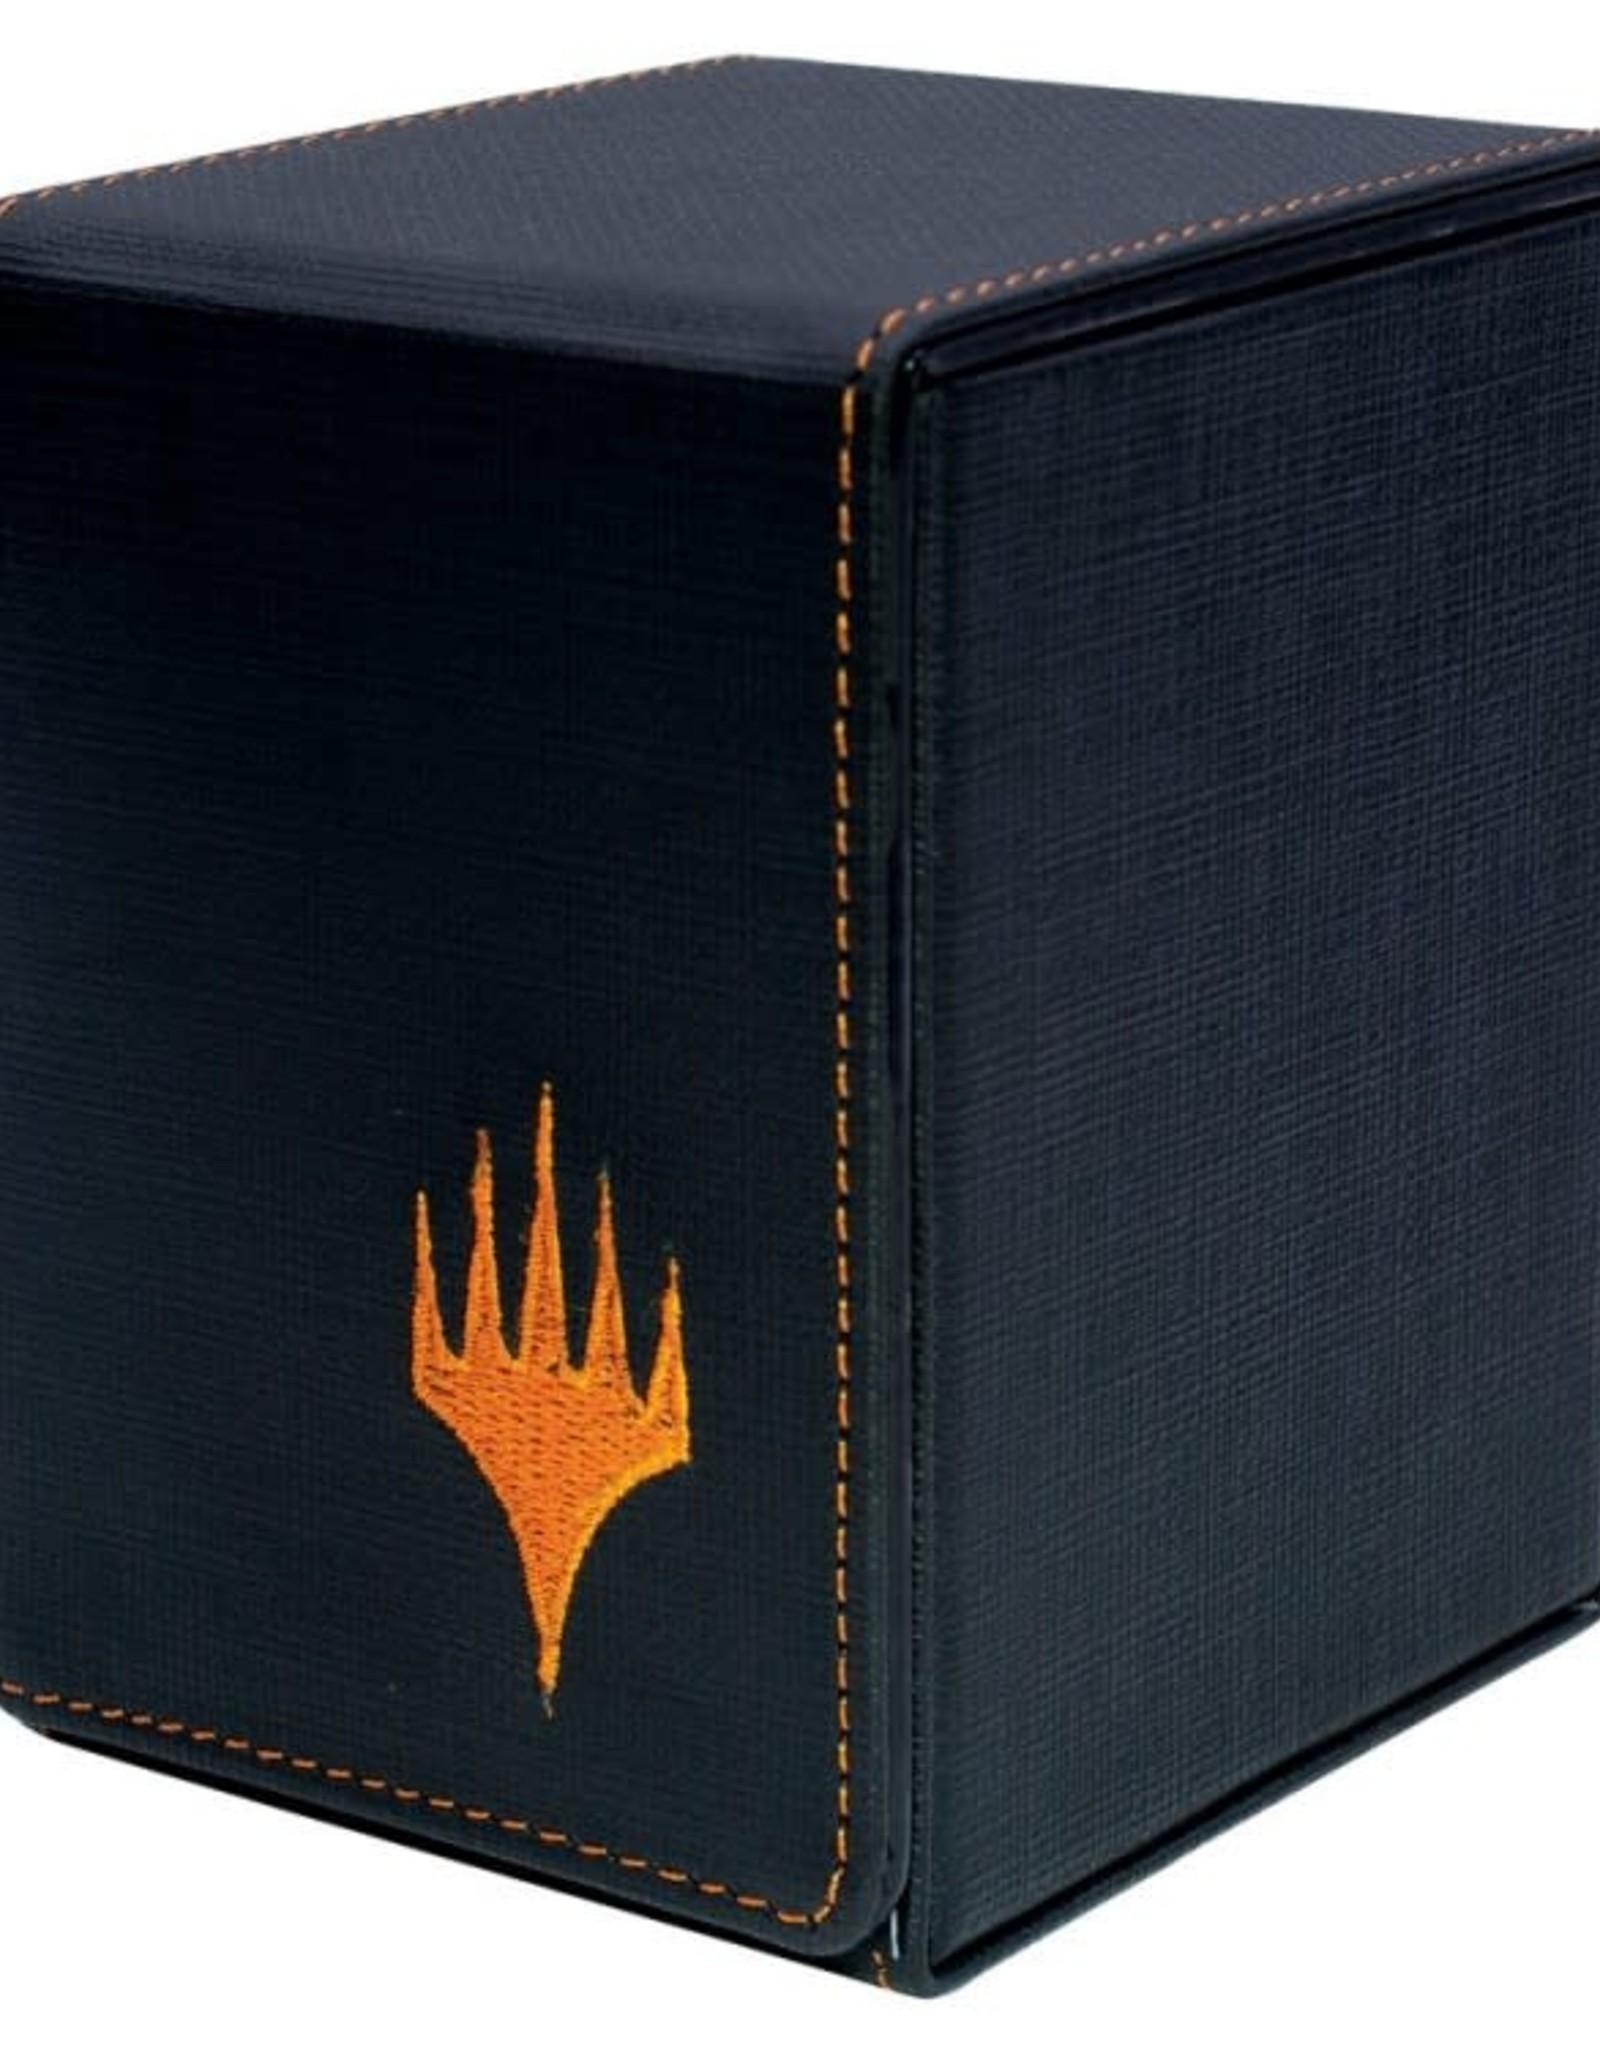 Ultra Pro Magic the Gathering: Alcove Flip Box - Mythic Edition